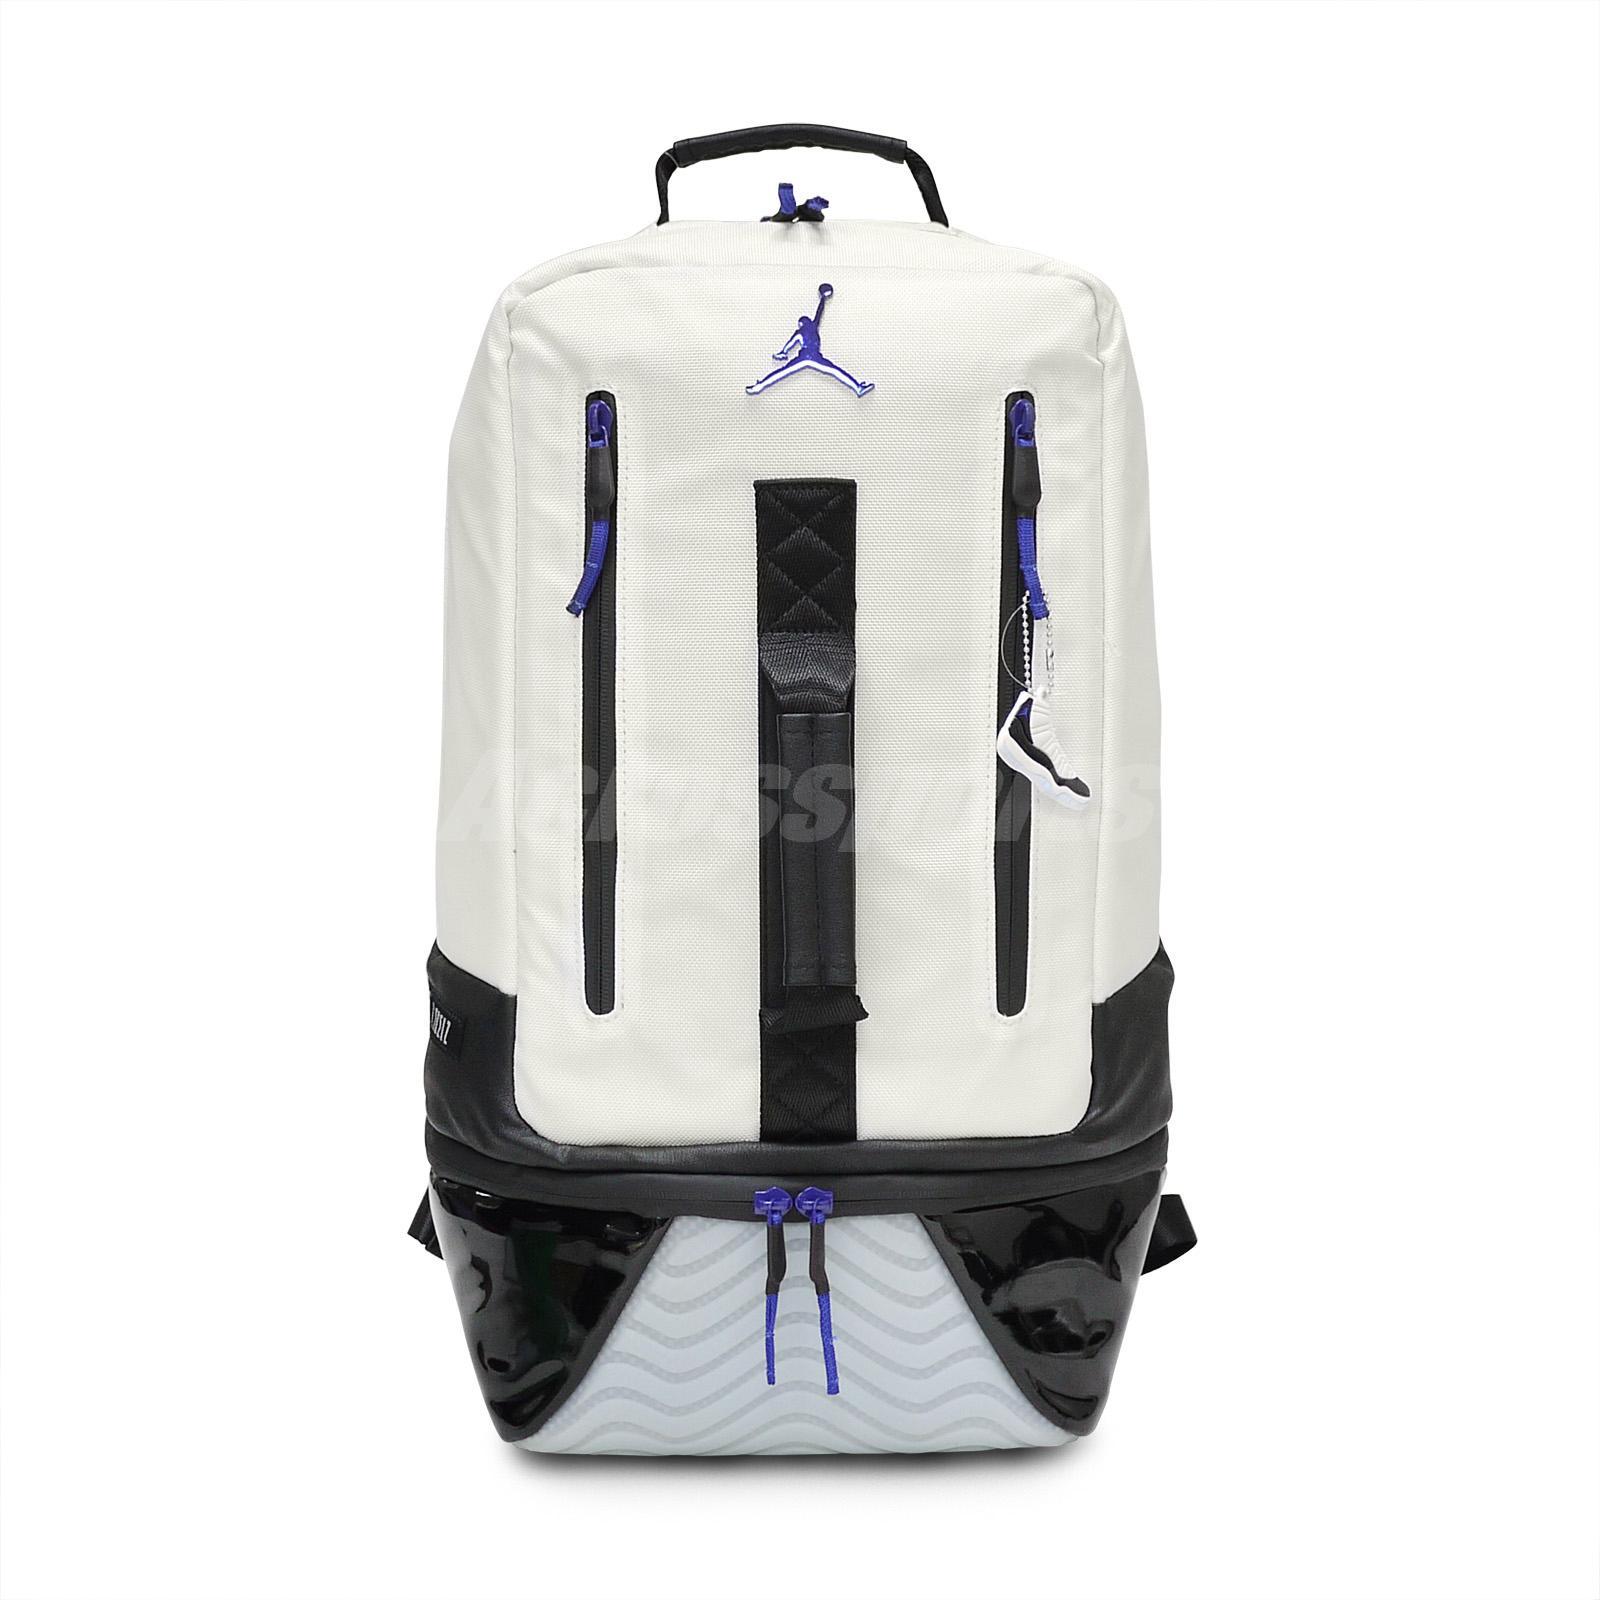 fc6543f65c0b Nike Air Jordan Retro 11 Concord XI White Black Backpack Bookbag ...